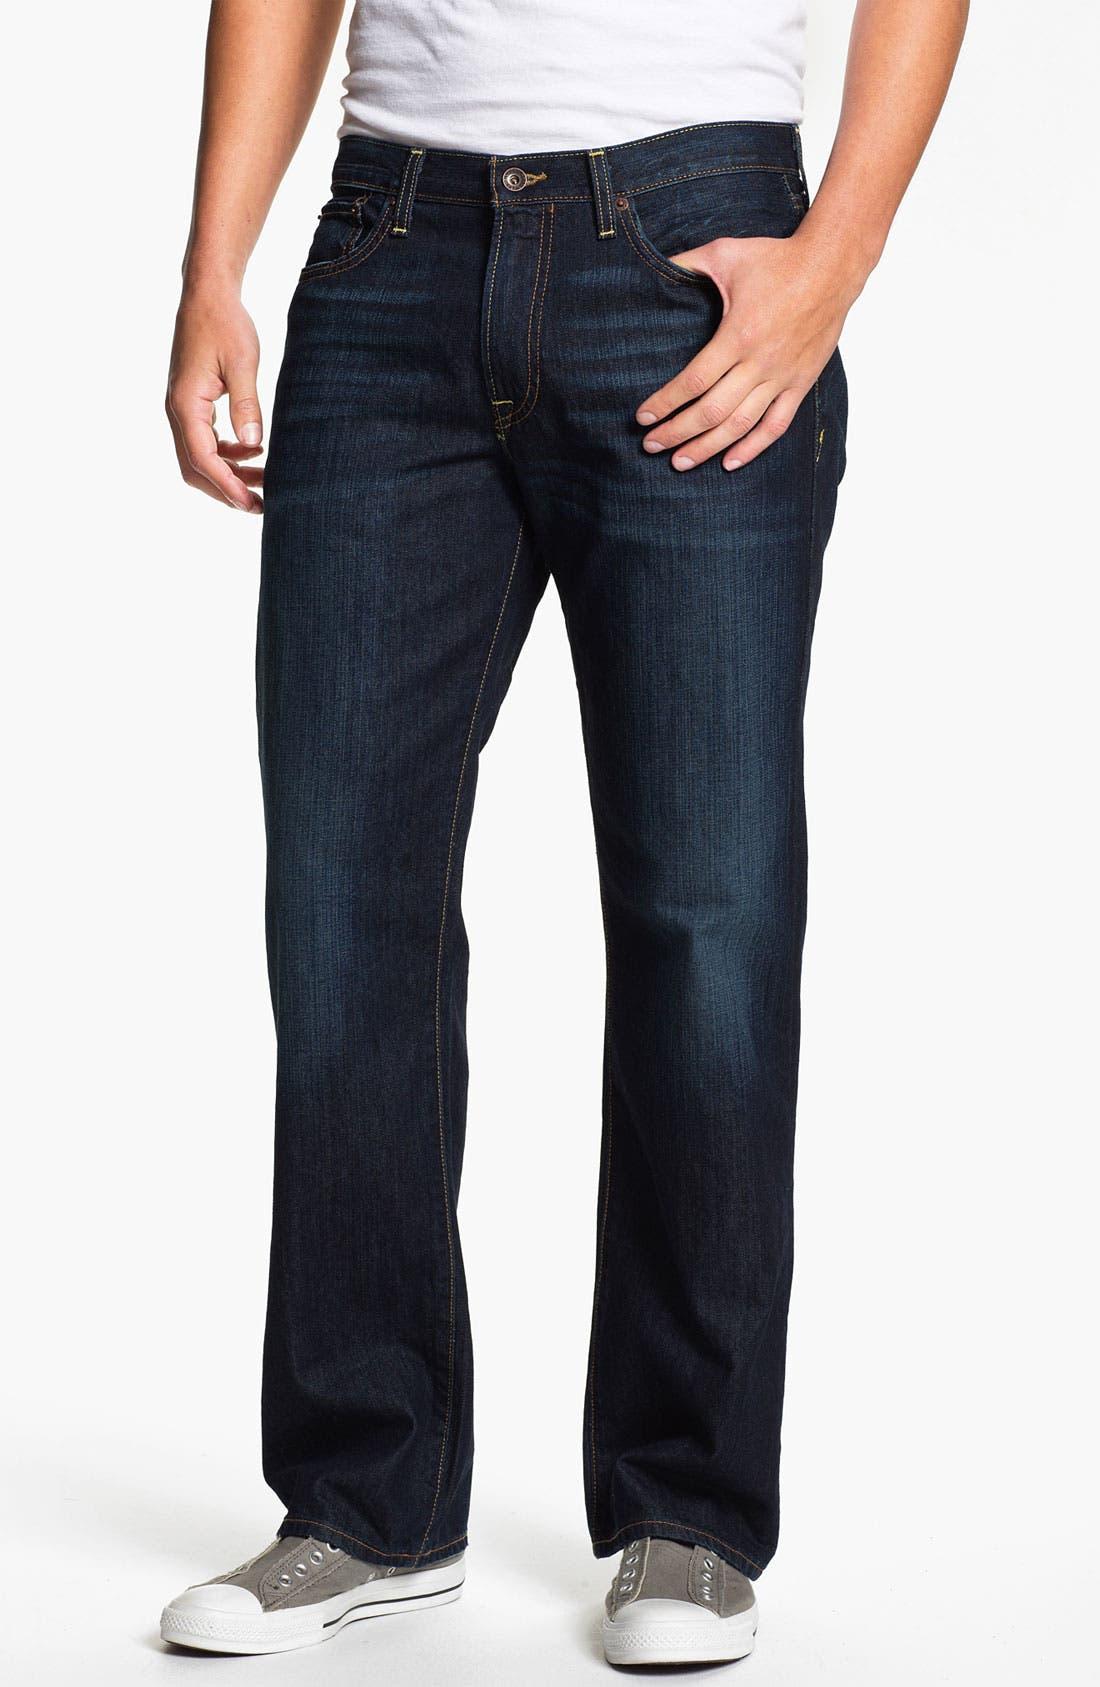 Alternate Image 1 Selected - Lucky Brand '361 Vintage' Straight Leg Jeans (Ol' Oklahoma)